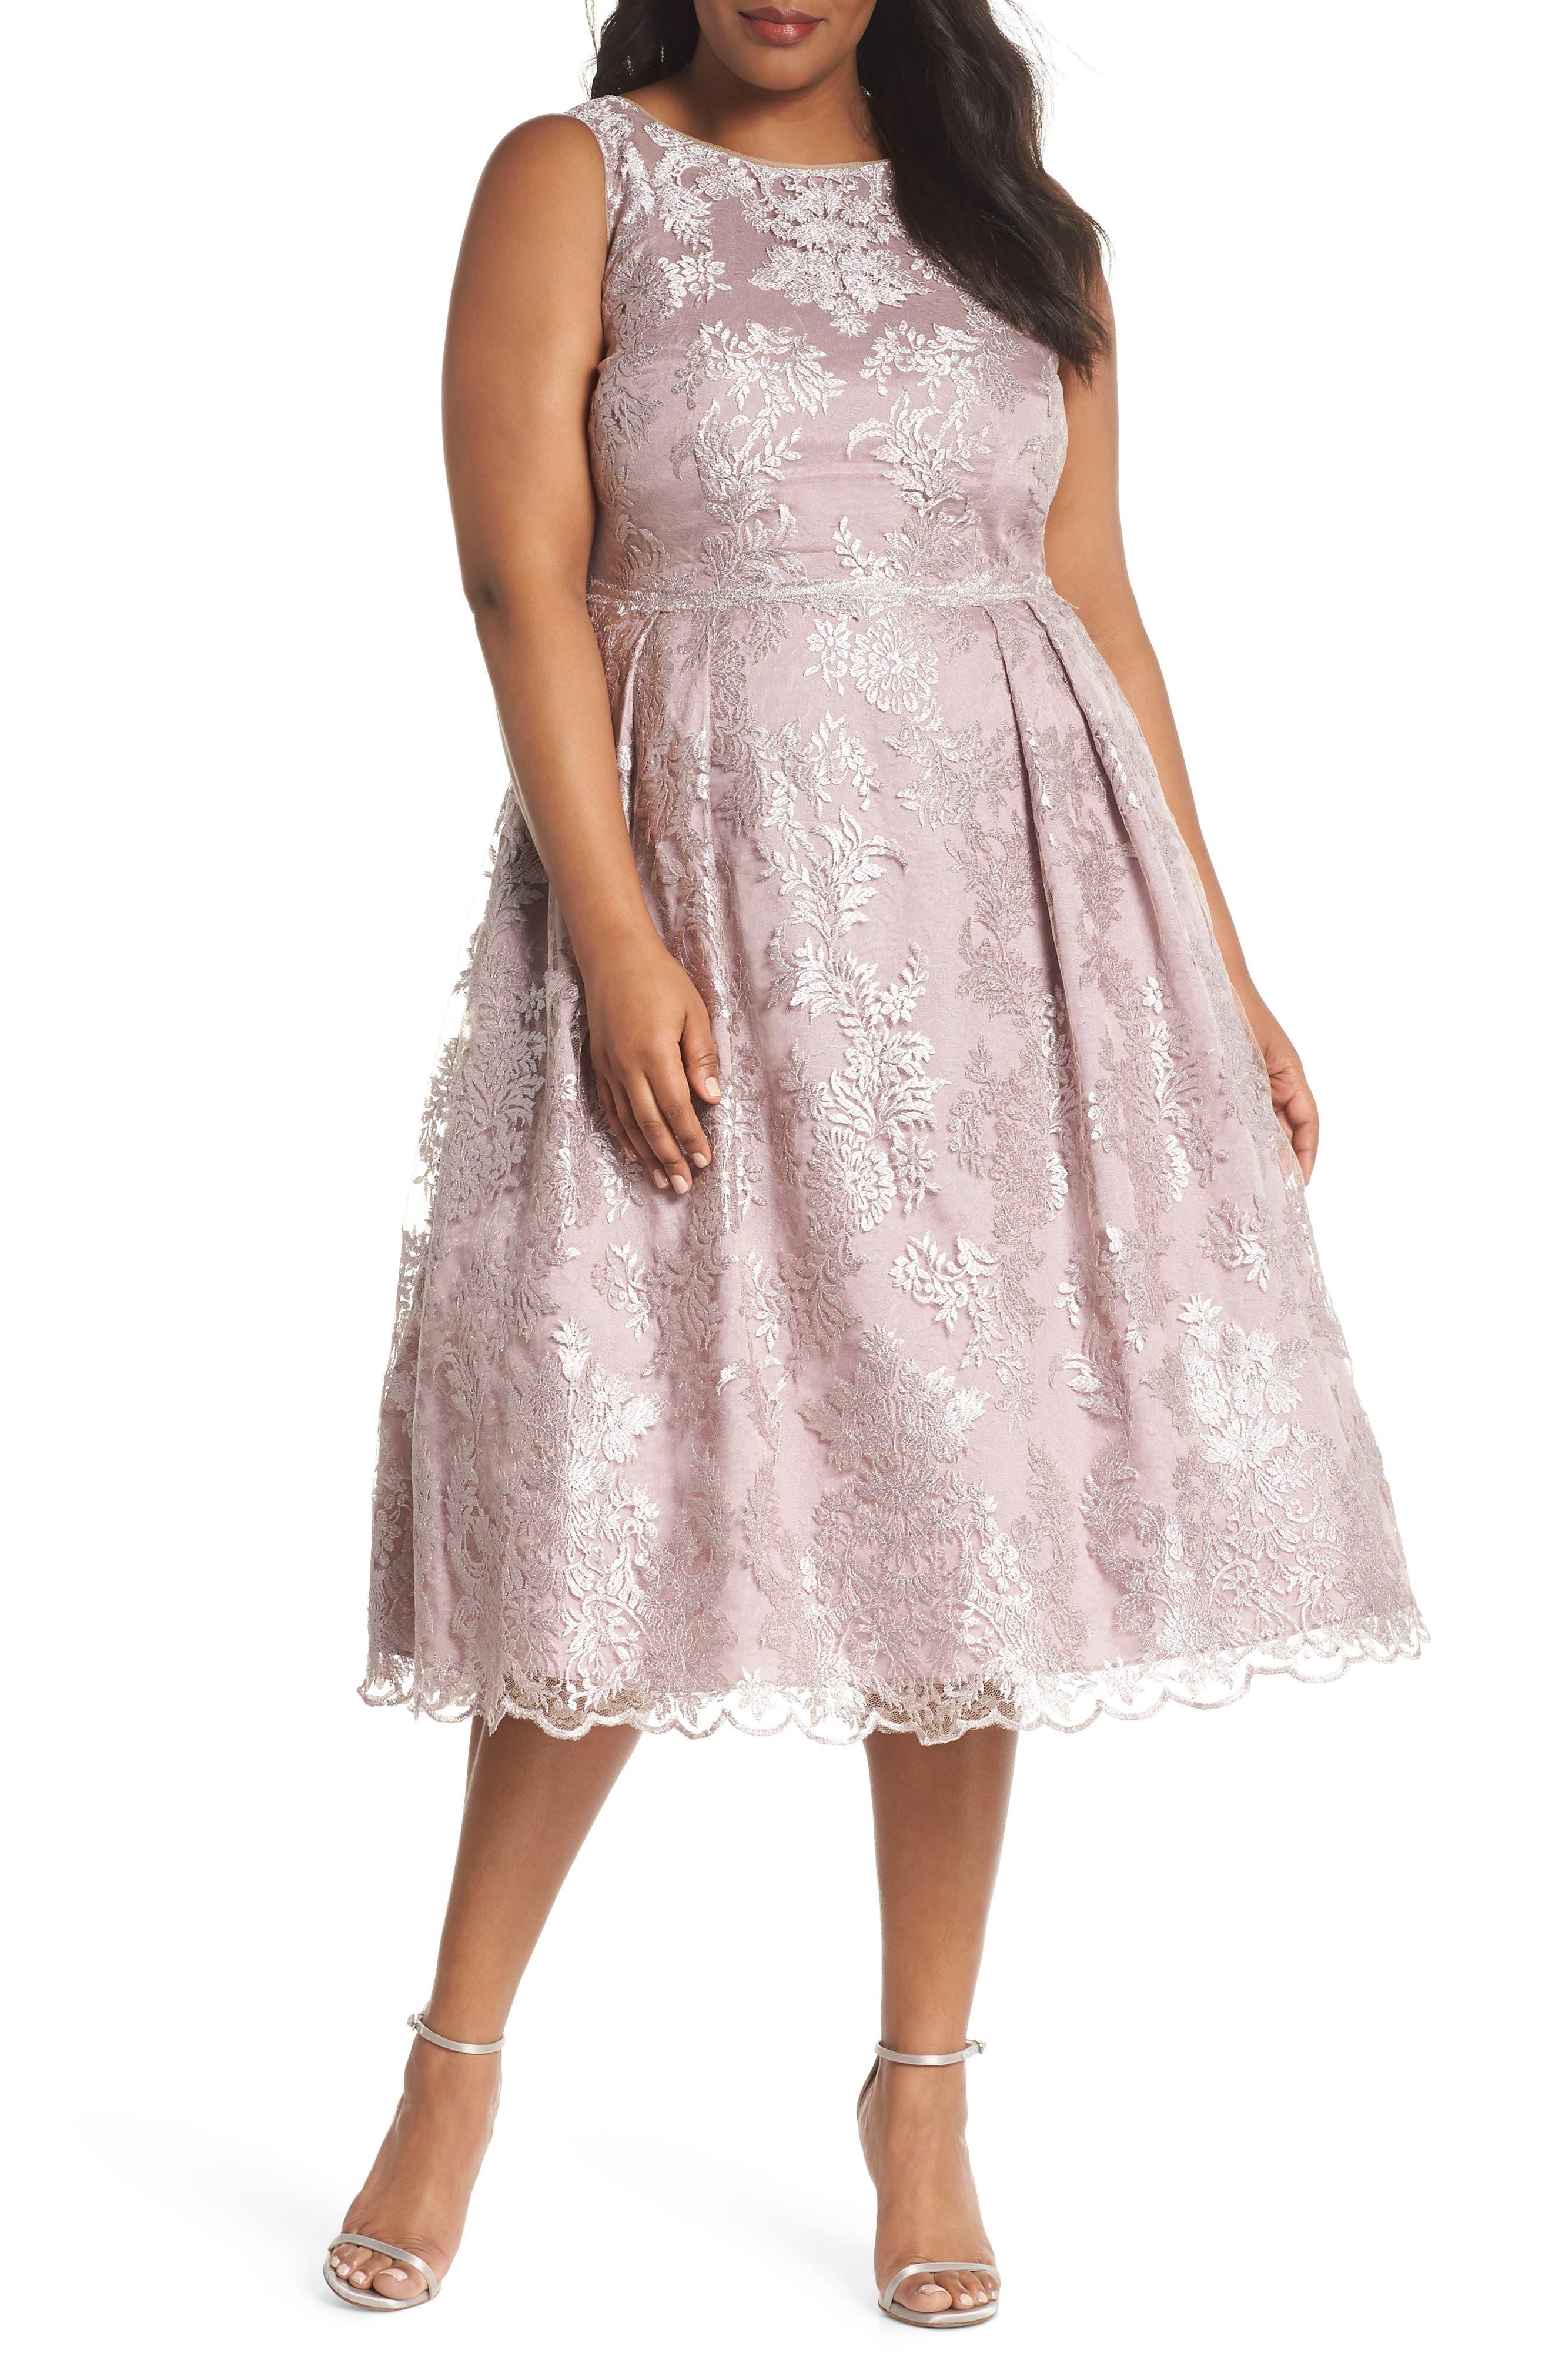 ADRIANNA PAPELL,                             Metallic Embroidered Tea Length Dress,                             Main thumbnail 1, color,                             670